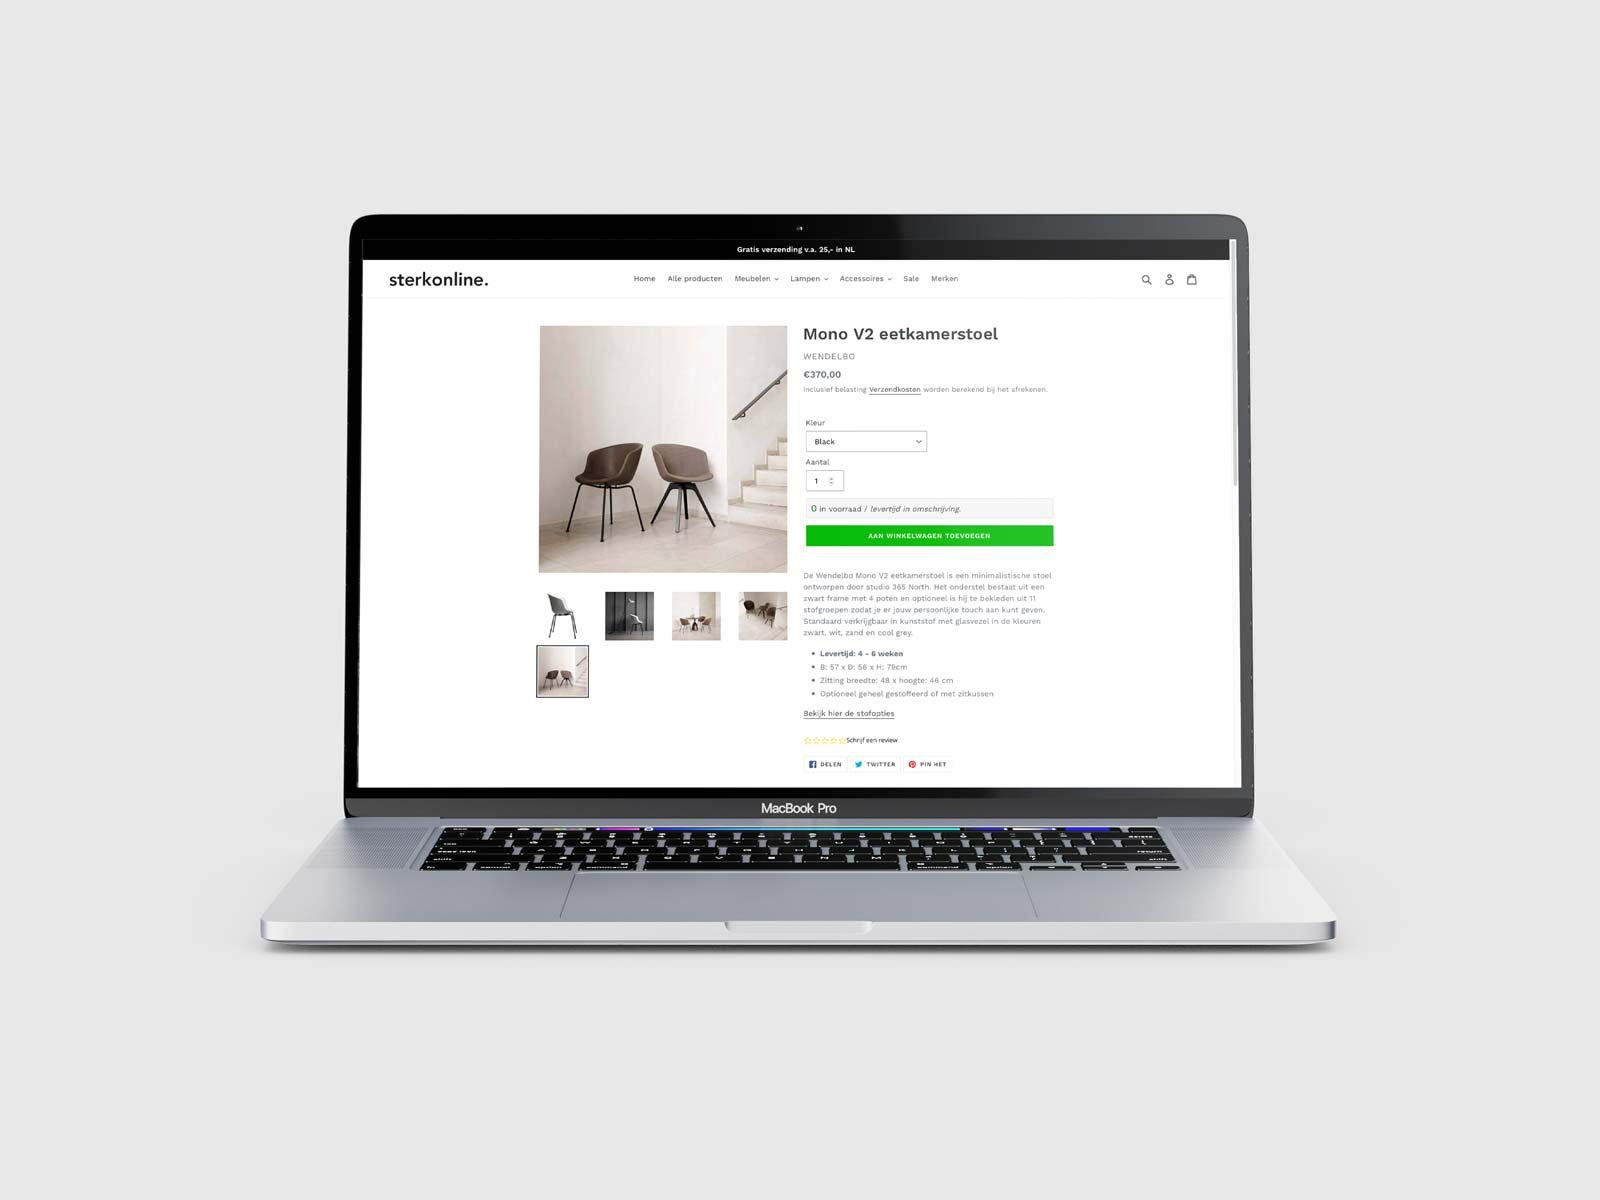 sterkonline-website